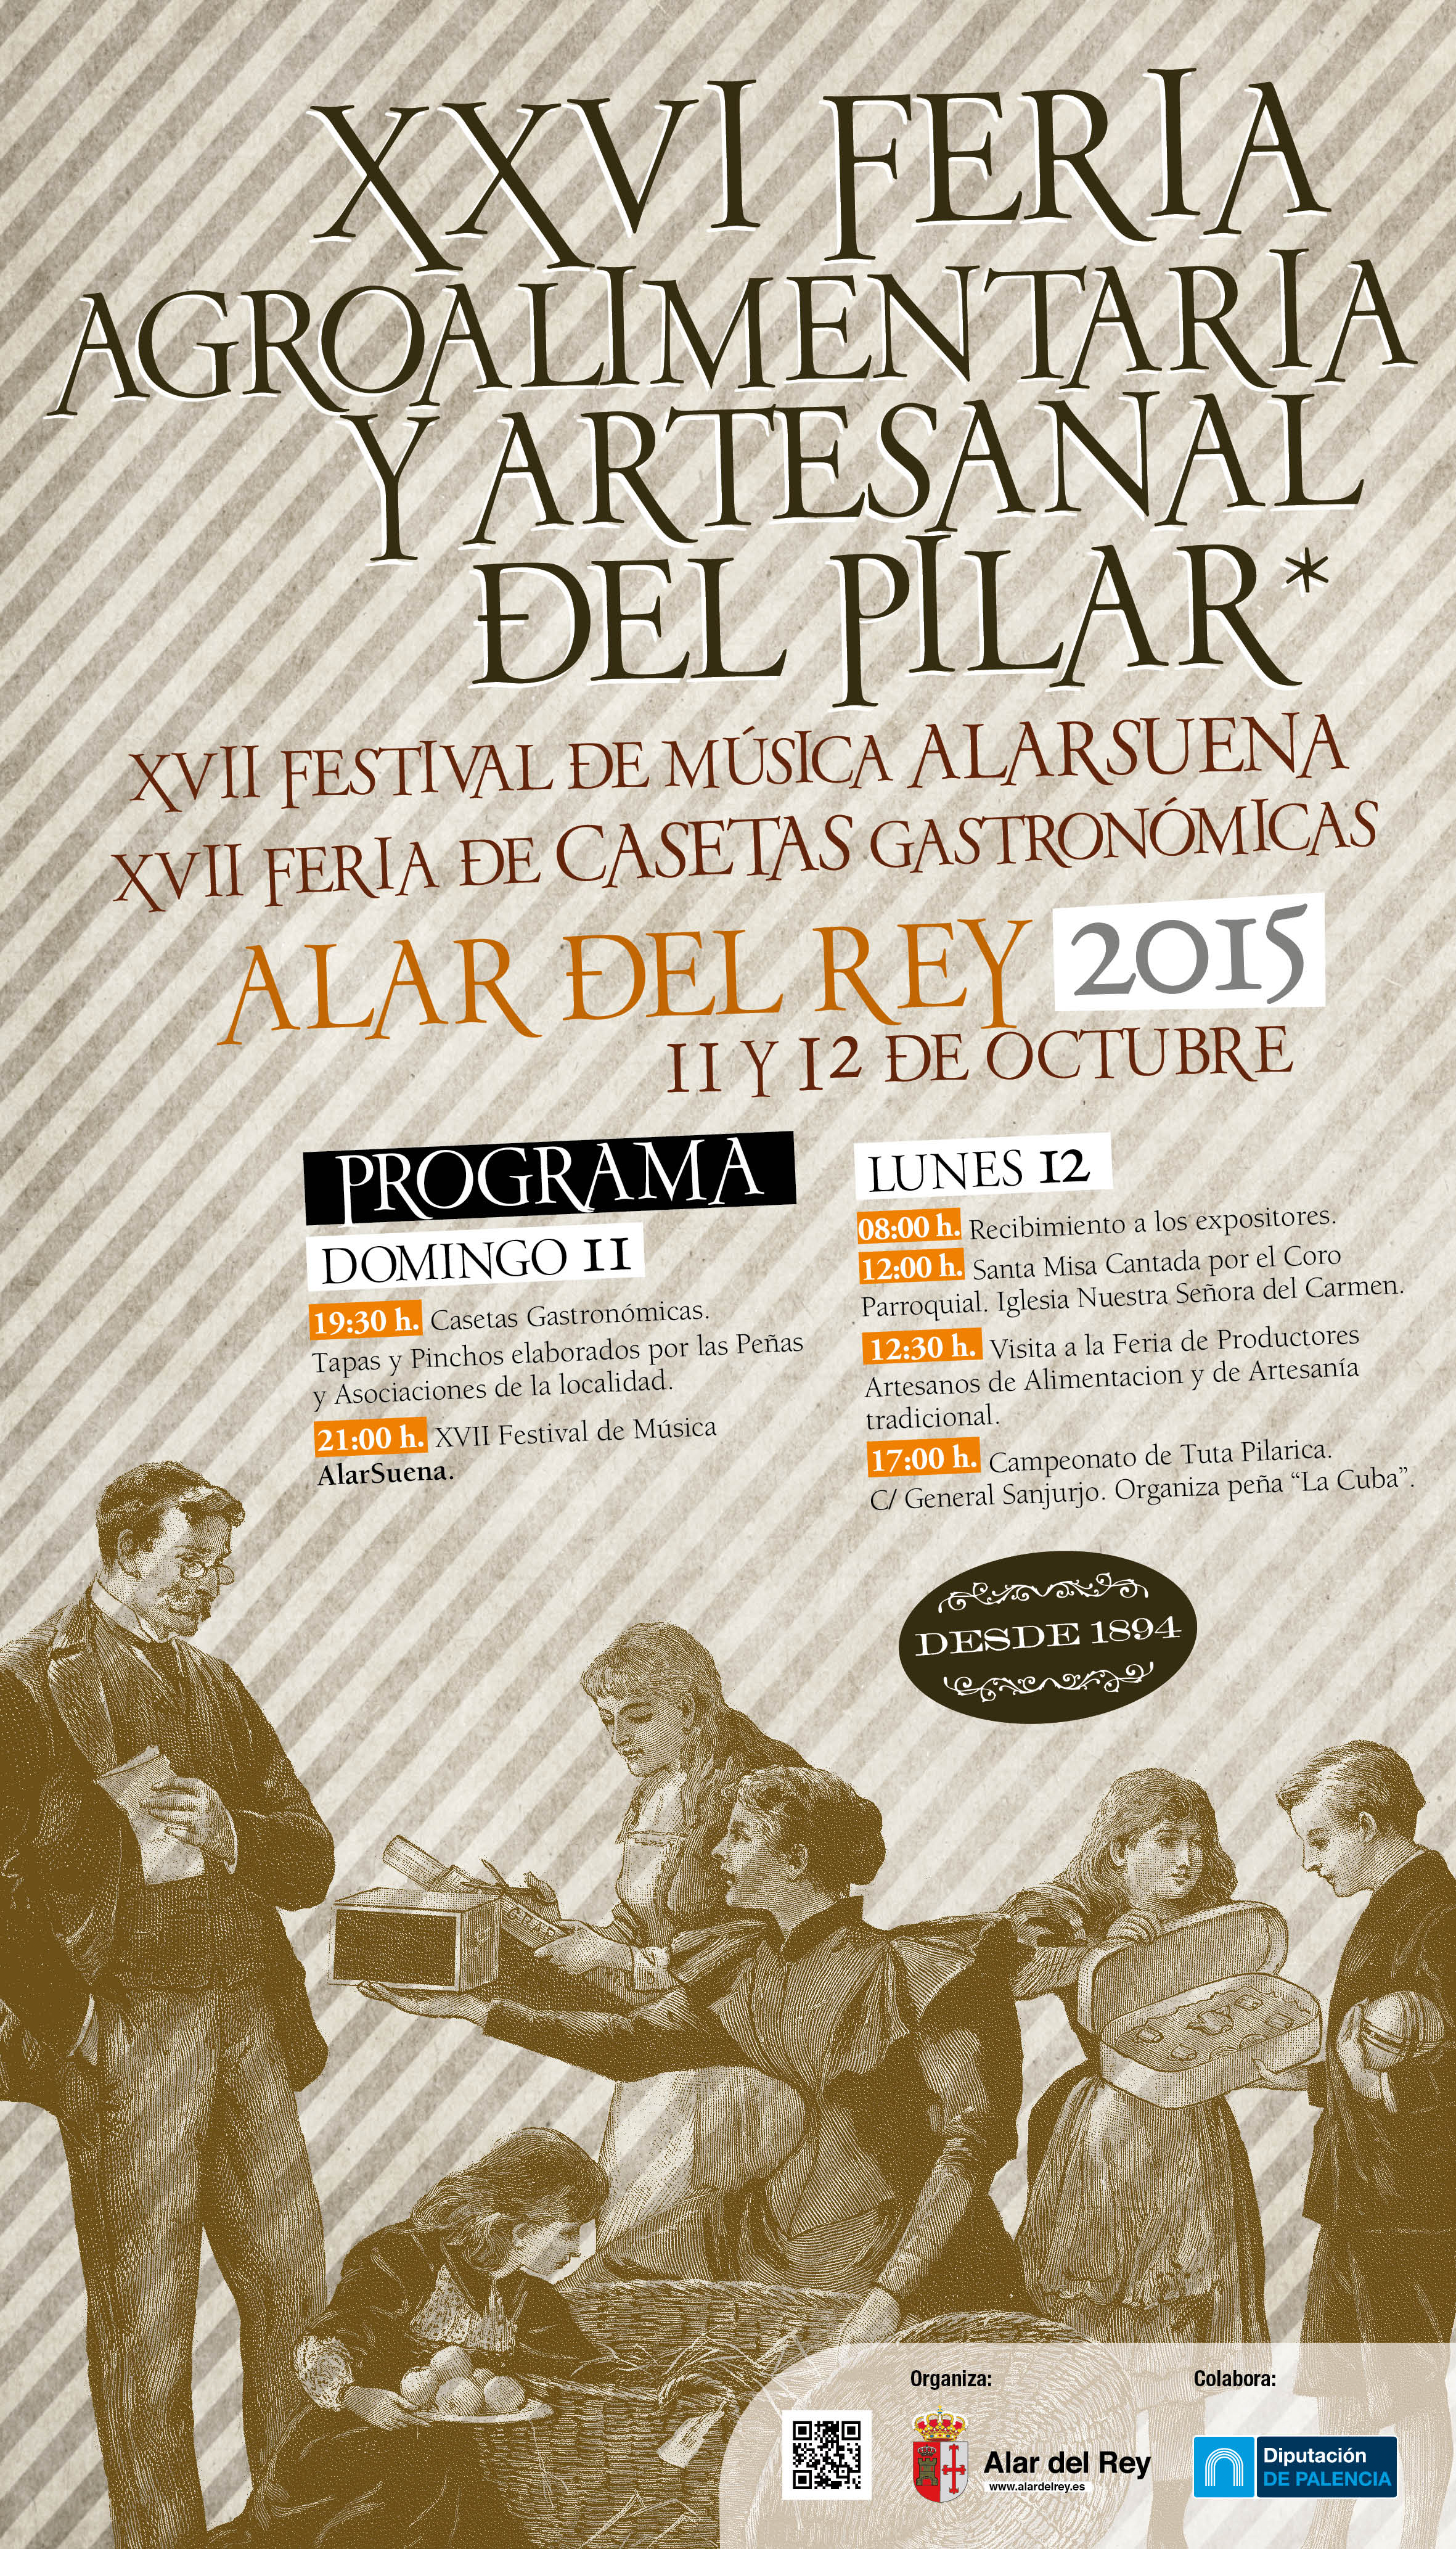 FERIA AGROALIMENTARIA Y ARTESANAL DEL PILAR 2015